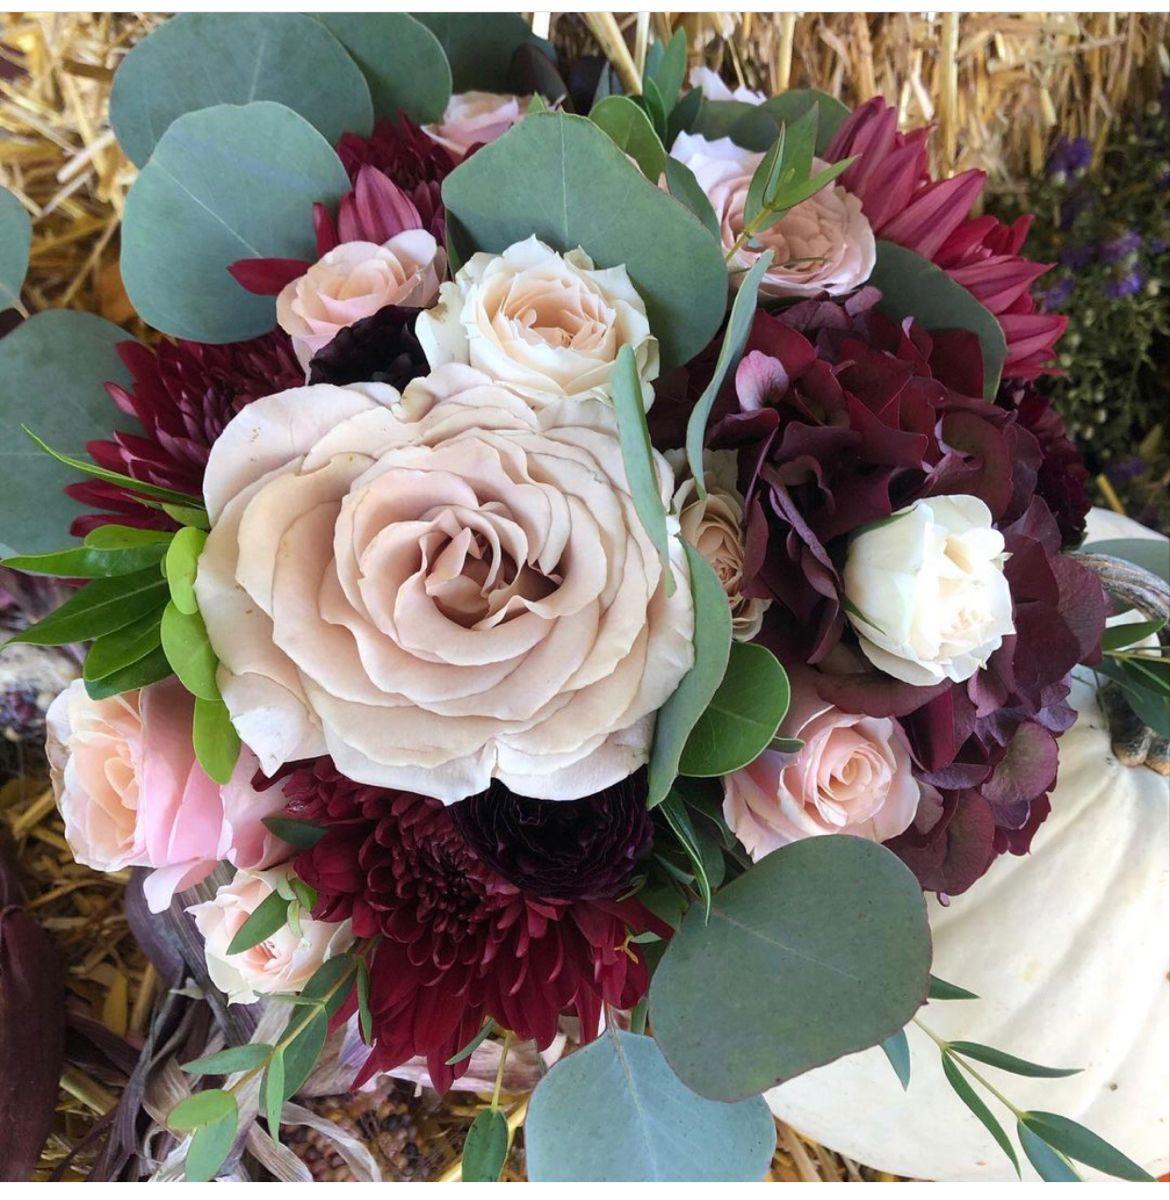 Burgundy Flowers In 2020 Burgundy Wedding Flowers Burgundy Flowers Wholesale Flowers